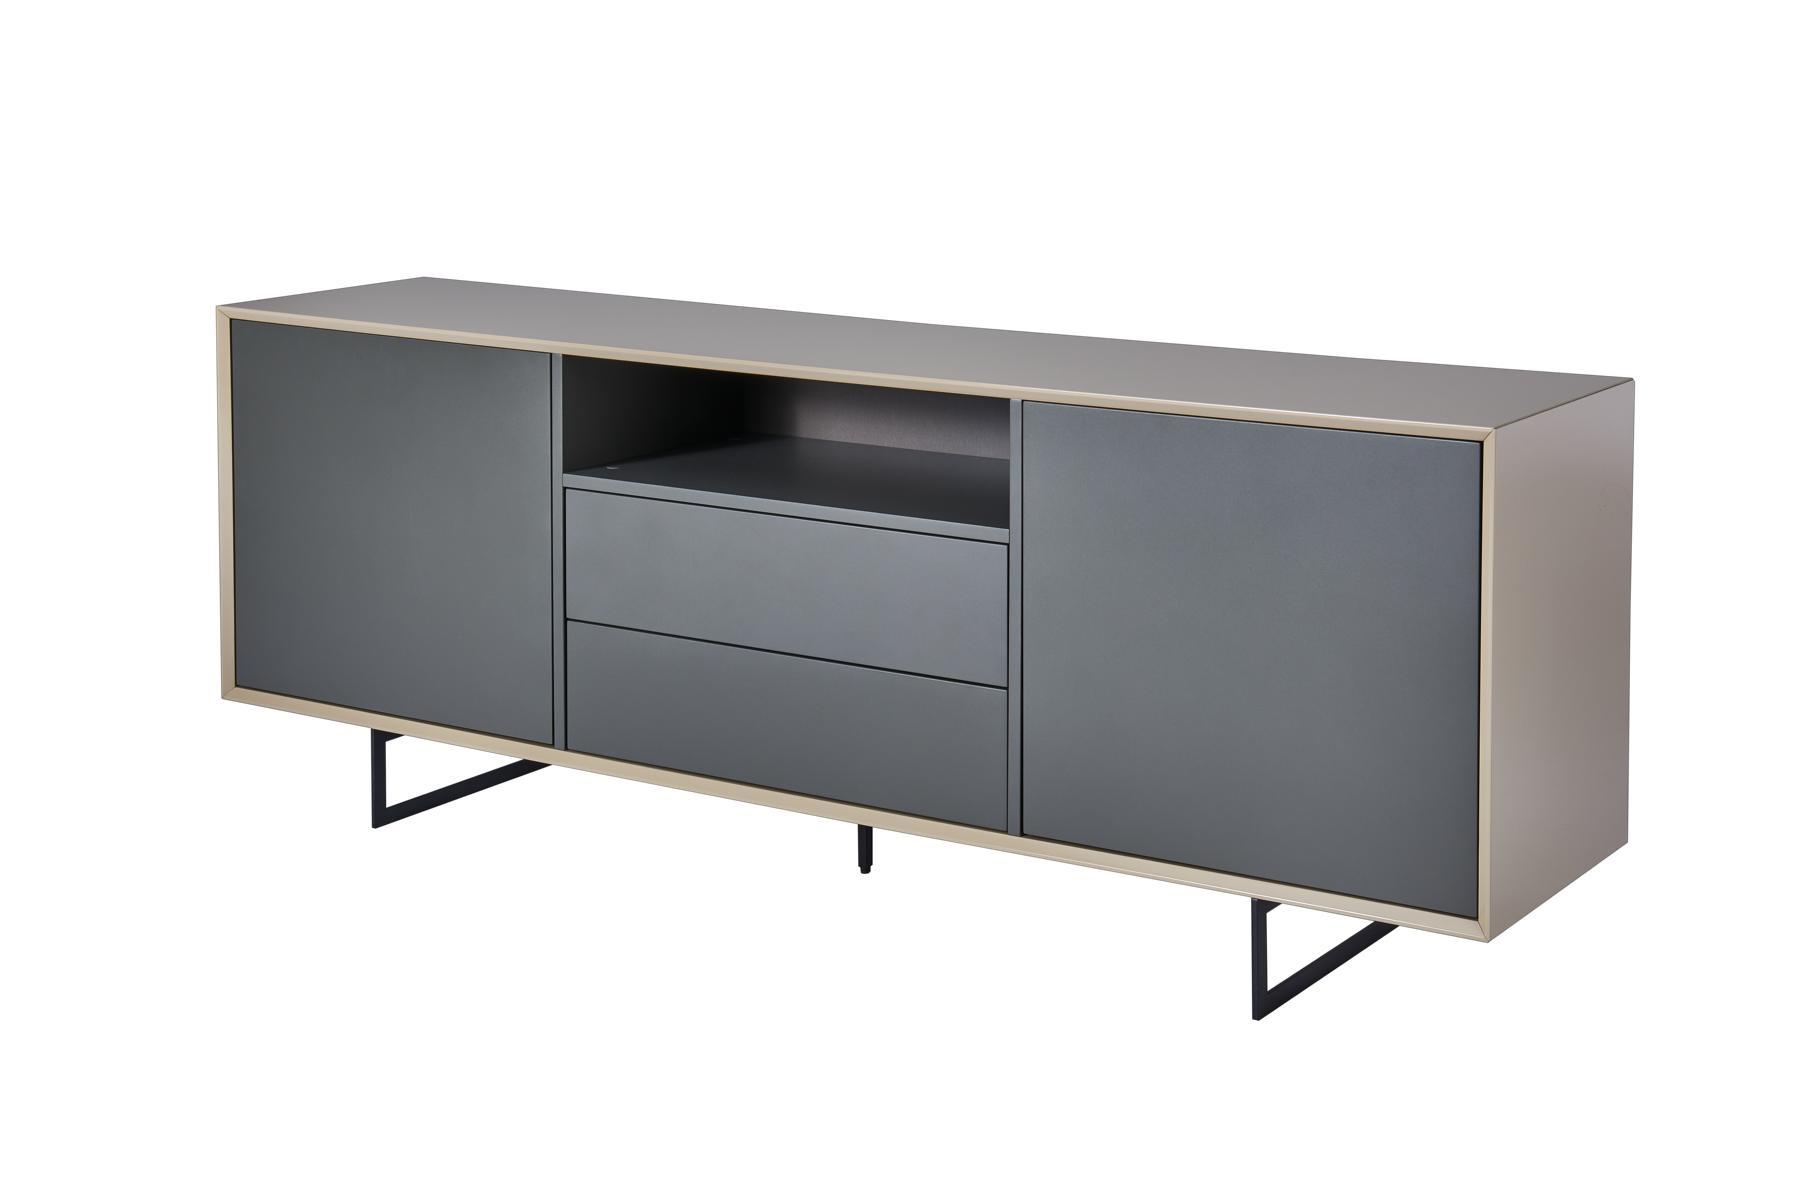 Sideboard Grau kommode sideboard titran beige grau anthrazit hochglanz sand matt